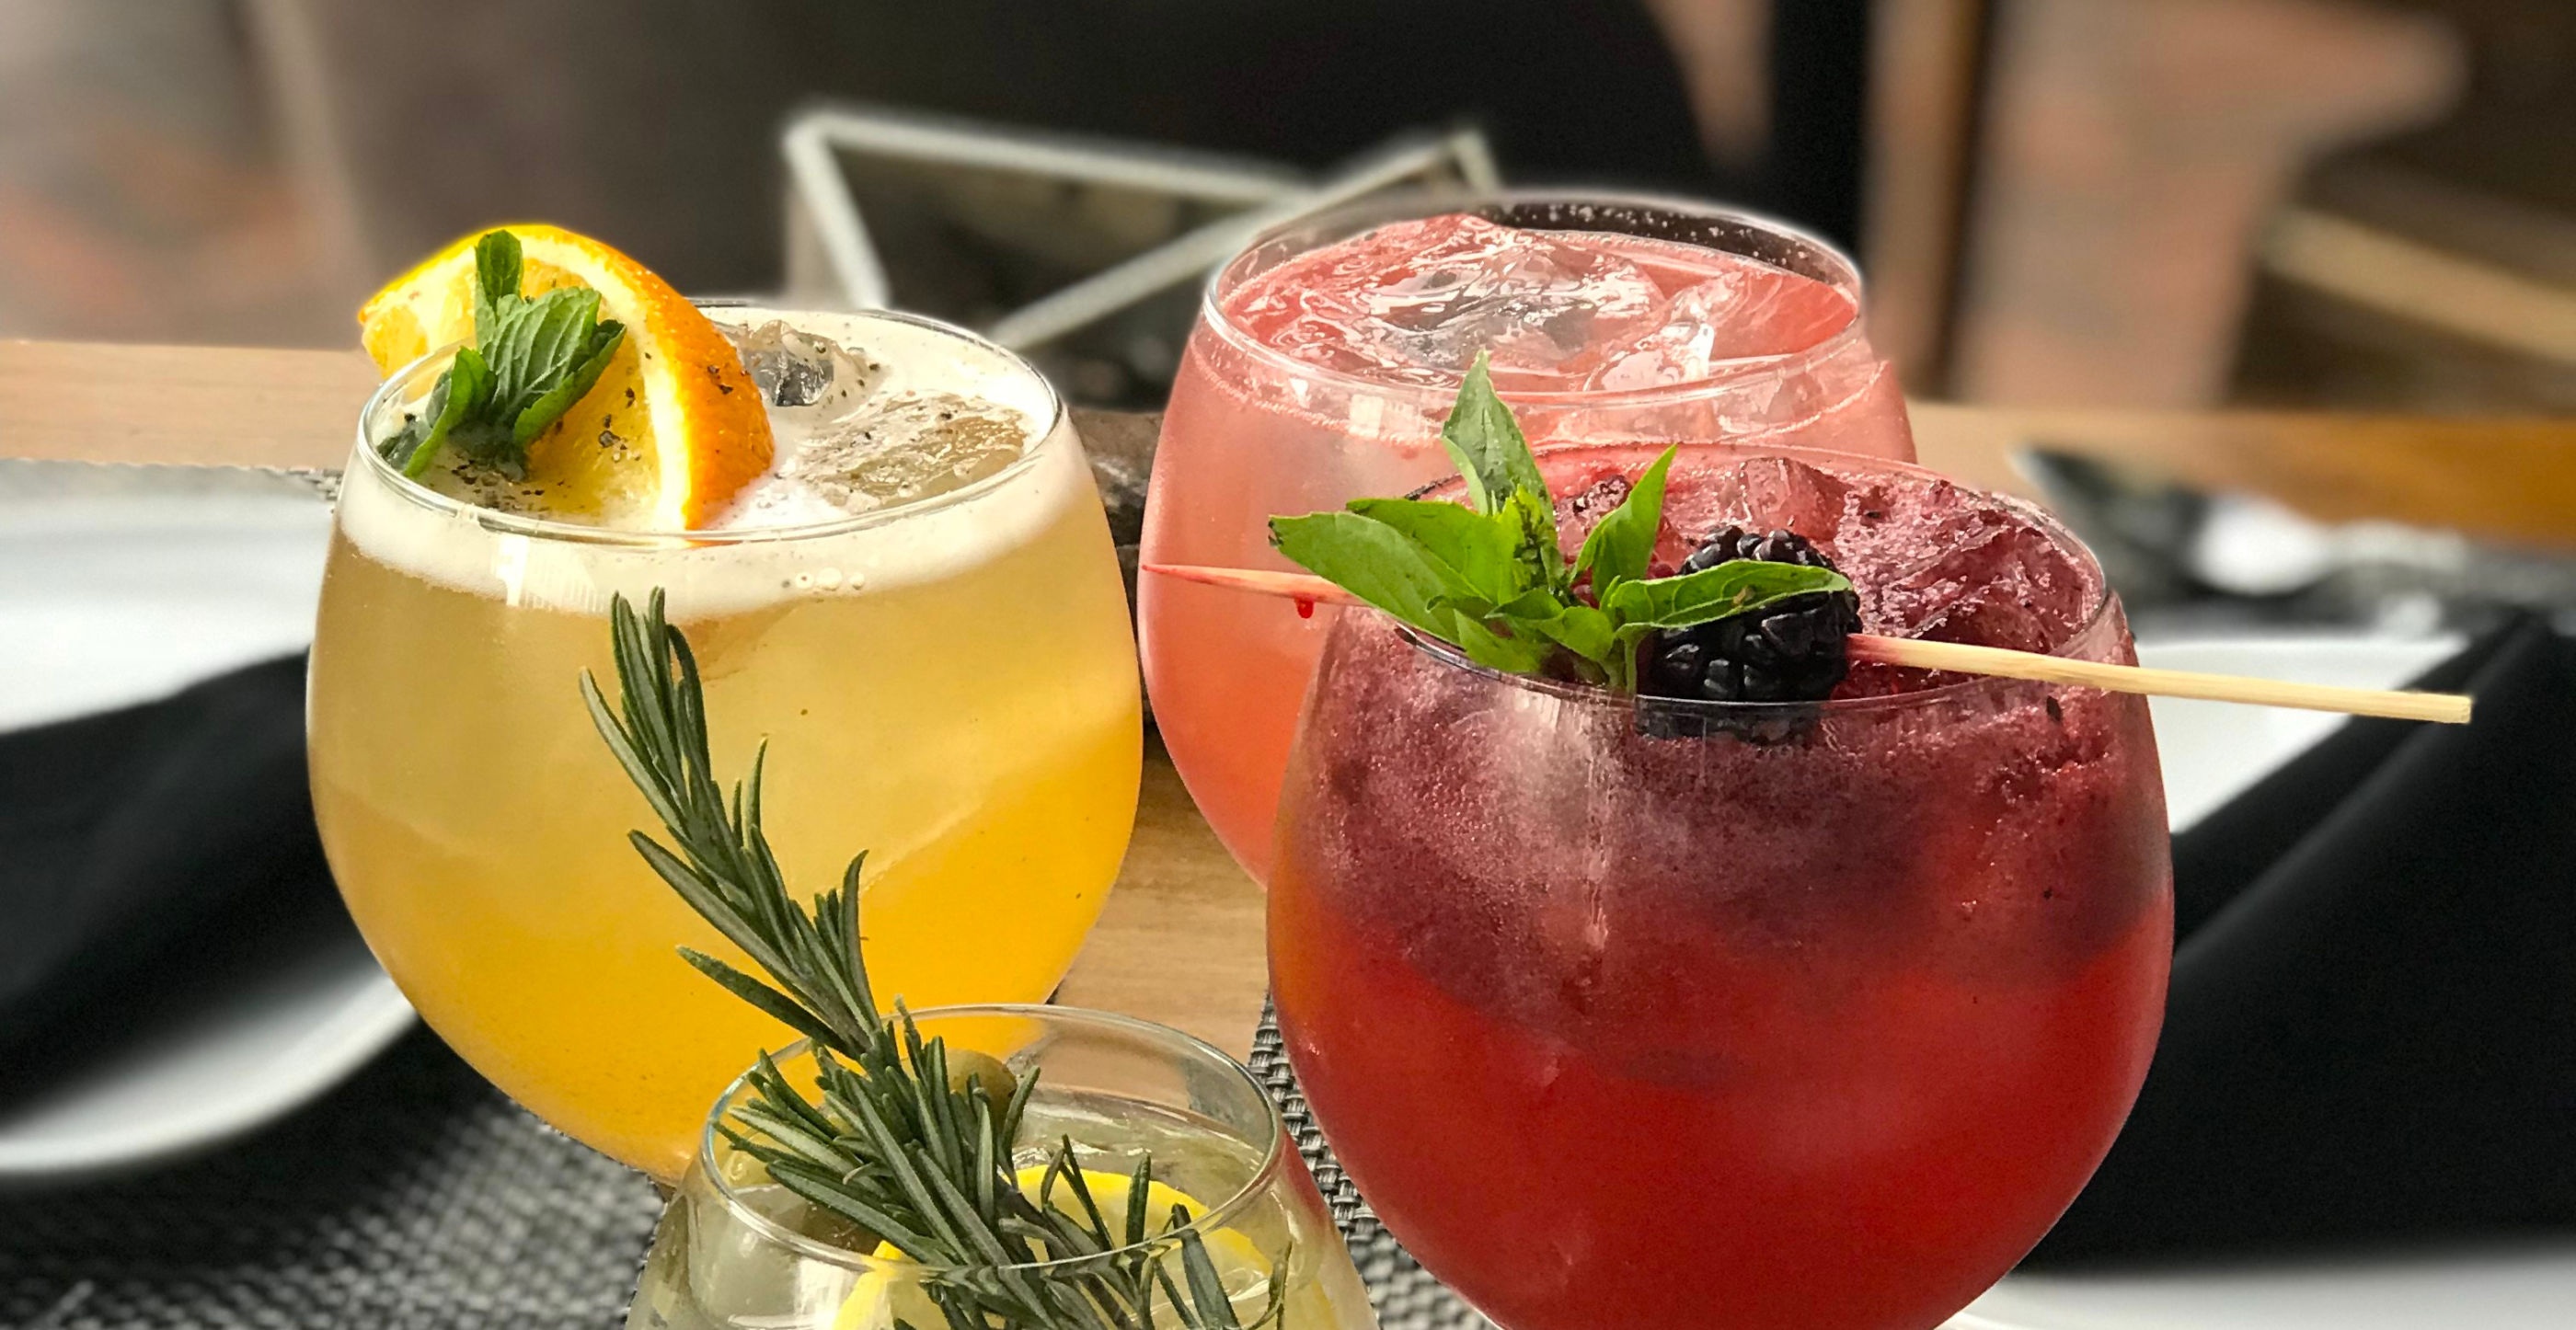 GIN GIN Santa Fe: Ginebra y delicias para compartir entre amigos